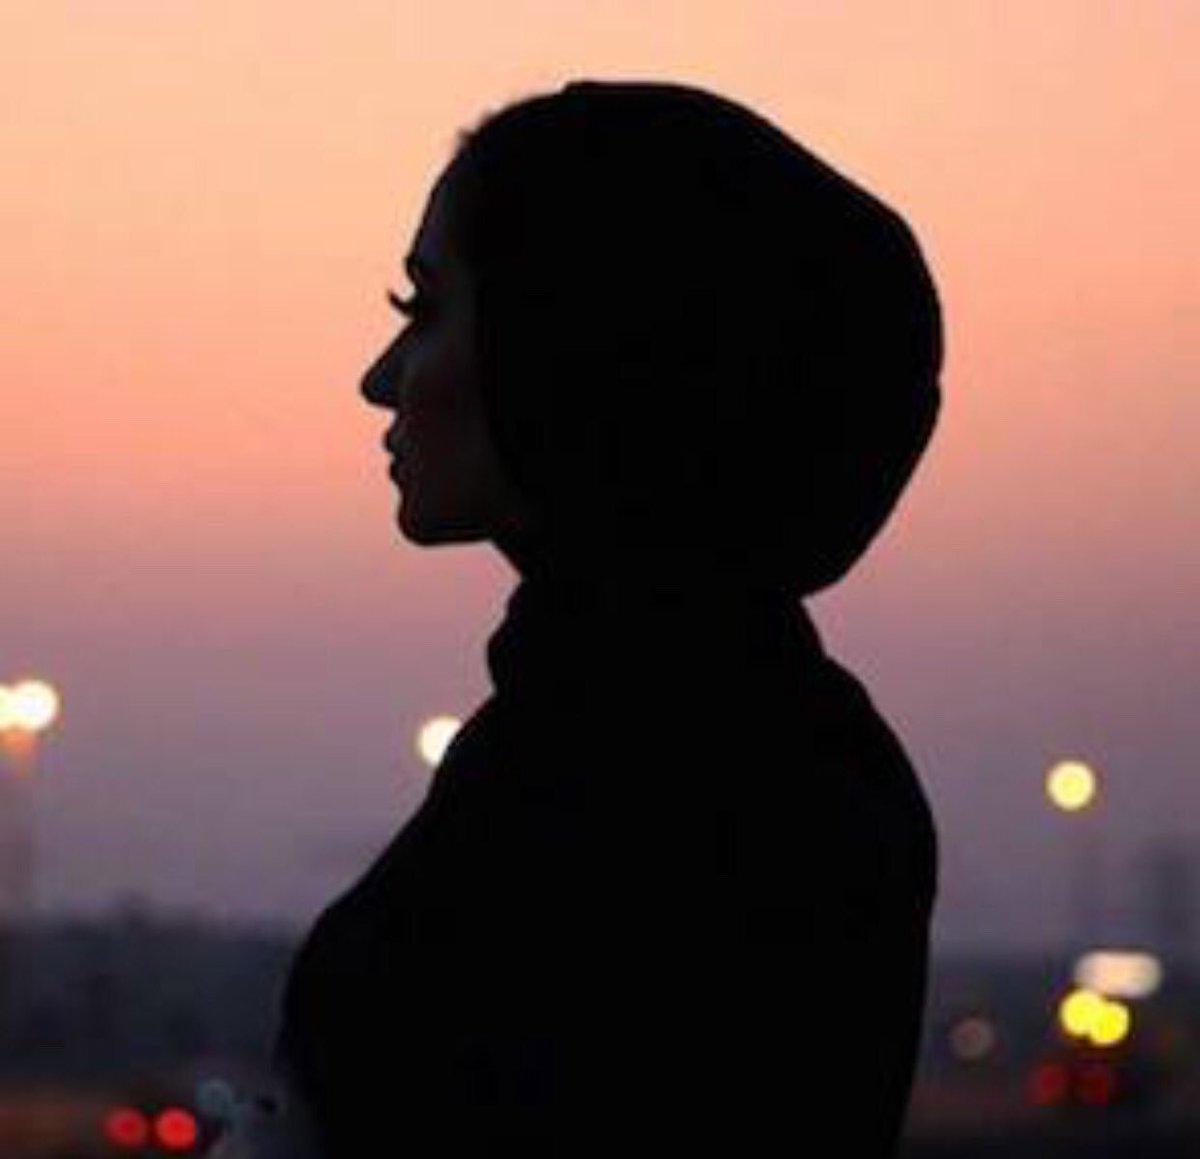 ئیسلام واتە خۆلادان لەحەرام نەك لەژیان. Islam means avoiding Haram not Life.